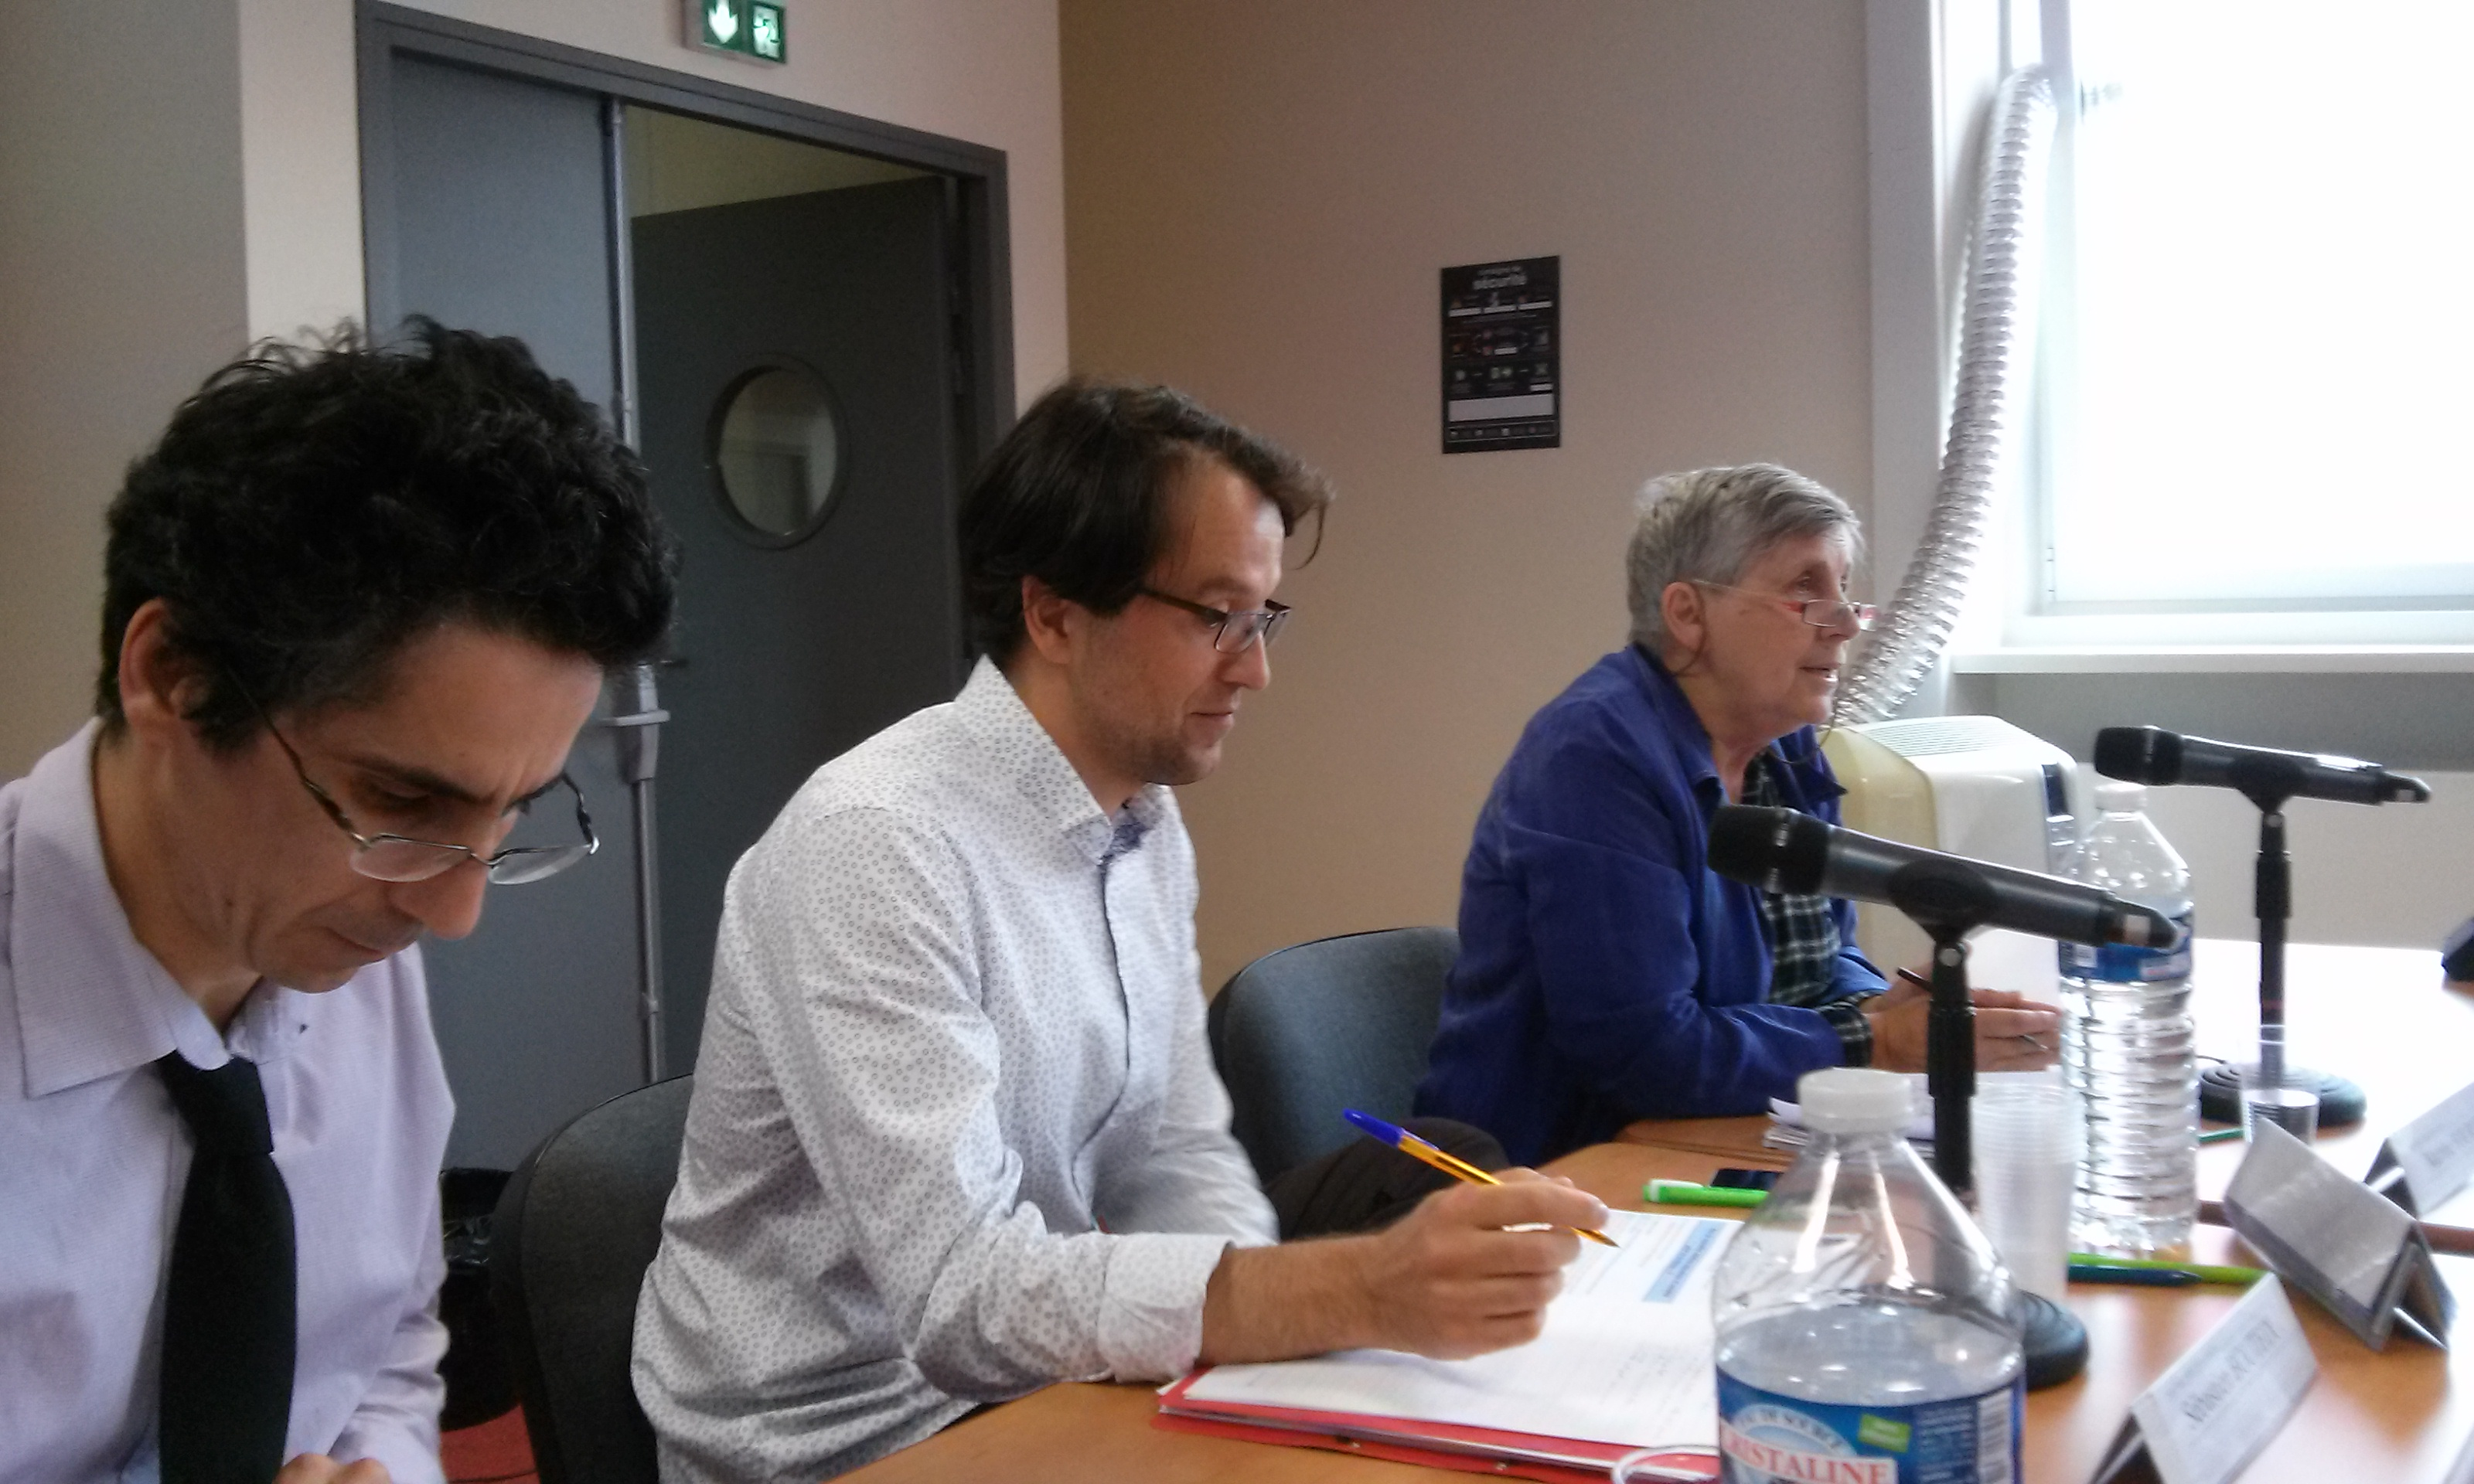 Jean-Philippe SEDIKHI, Sébastien BOUTEIX, Martine FOURIER